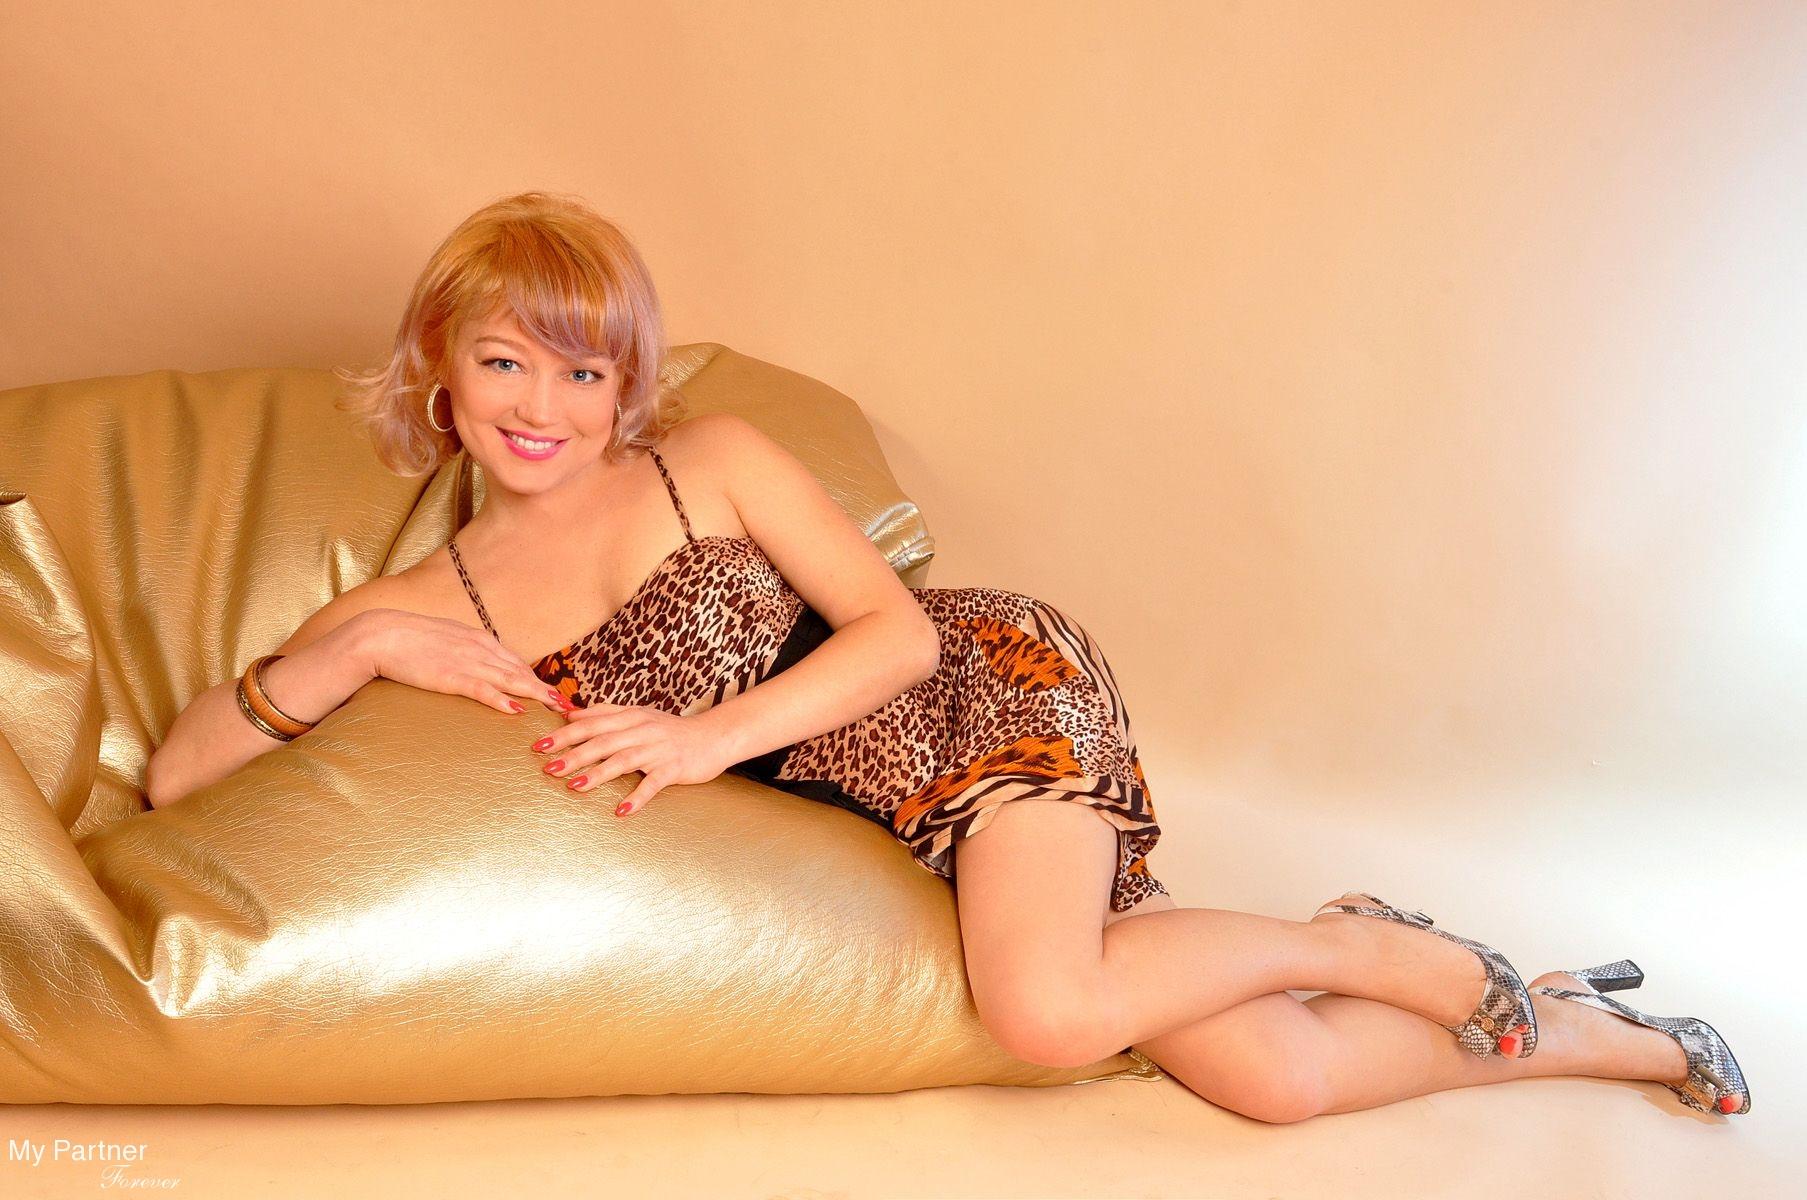 Ukrainian Or Russian Woman Already 35